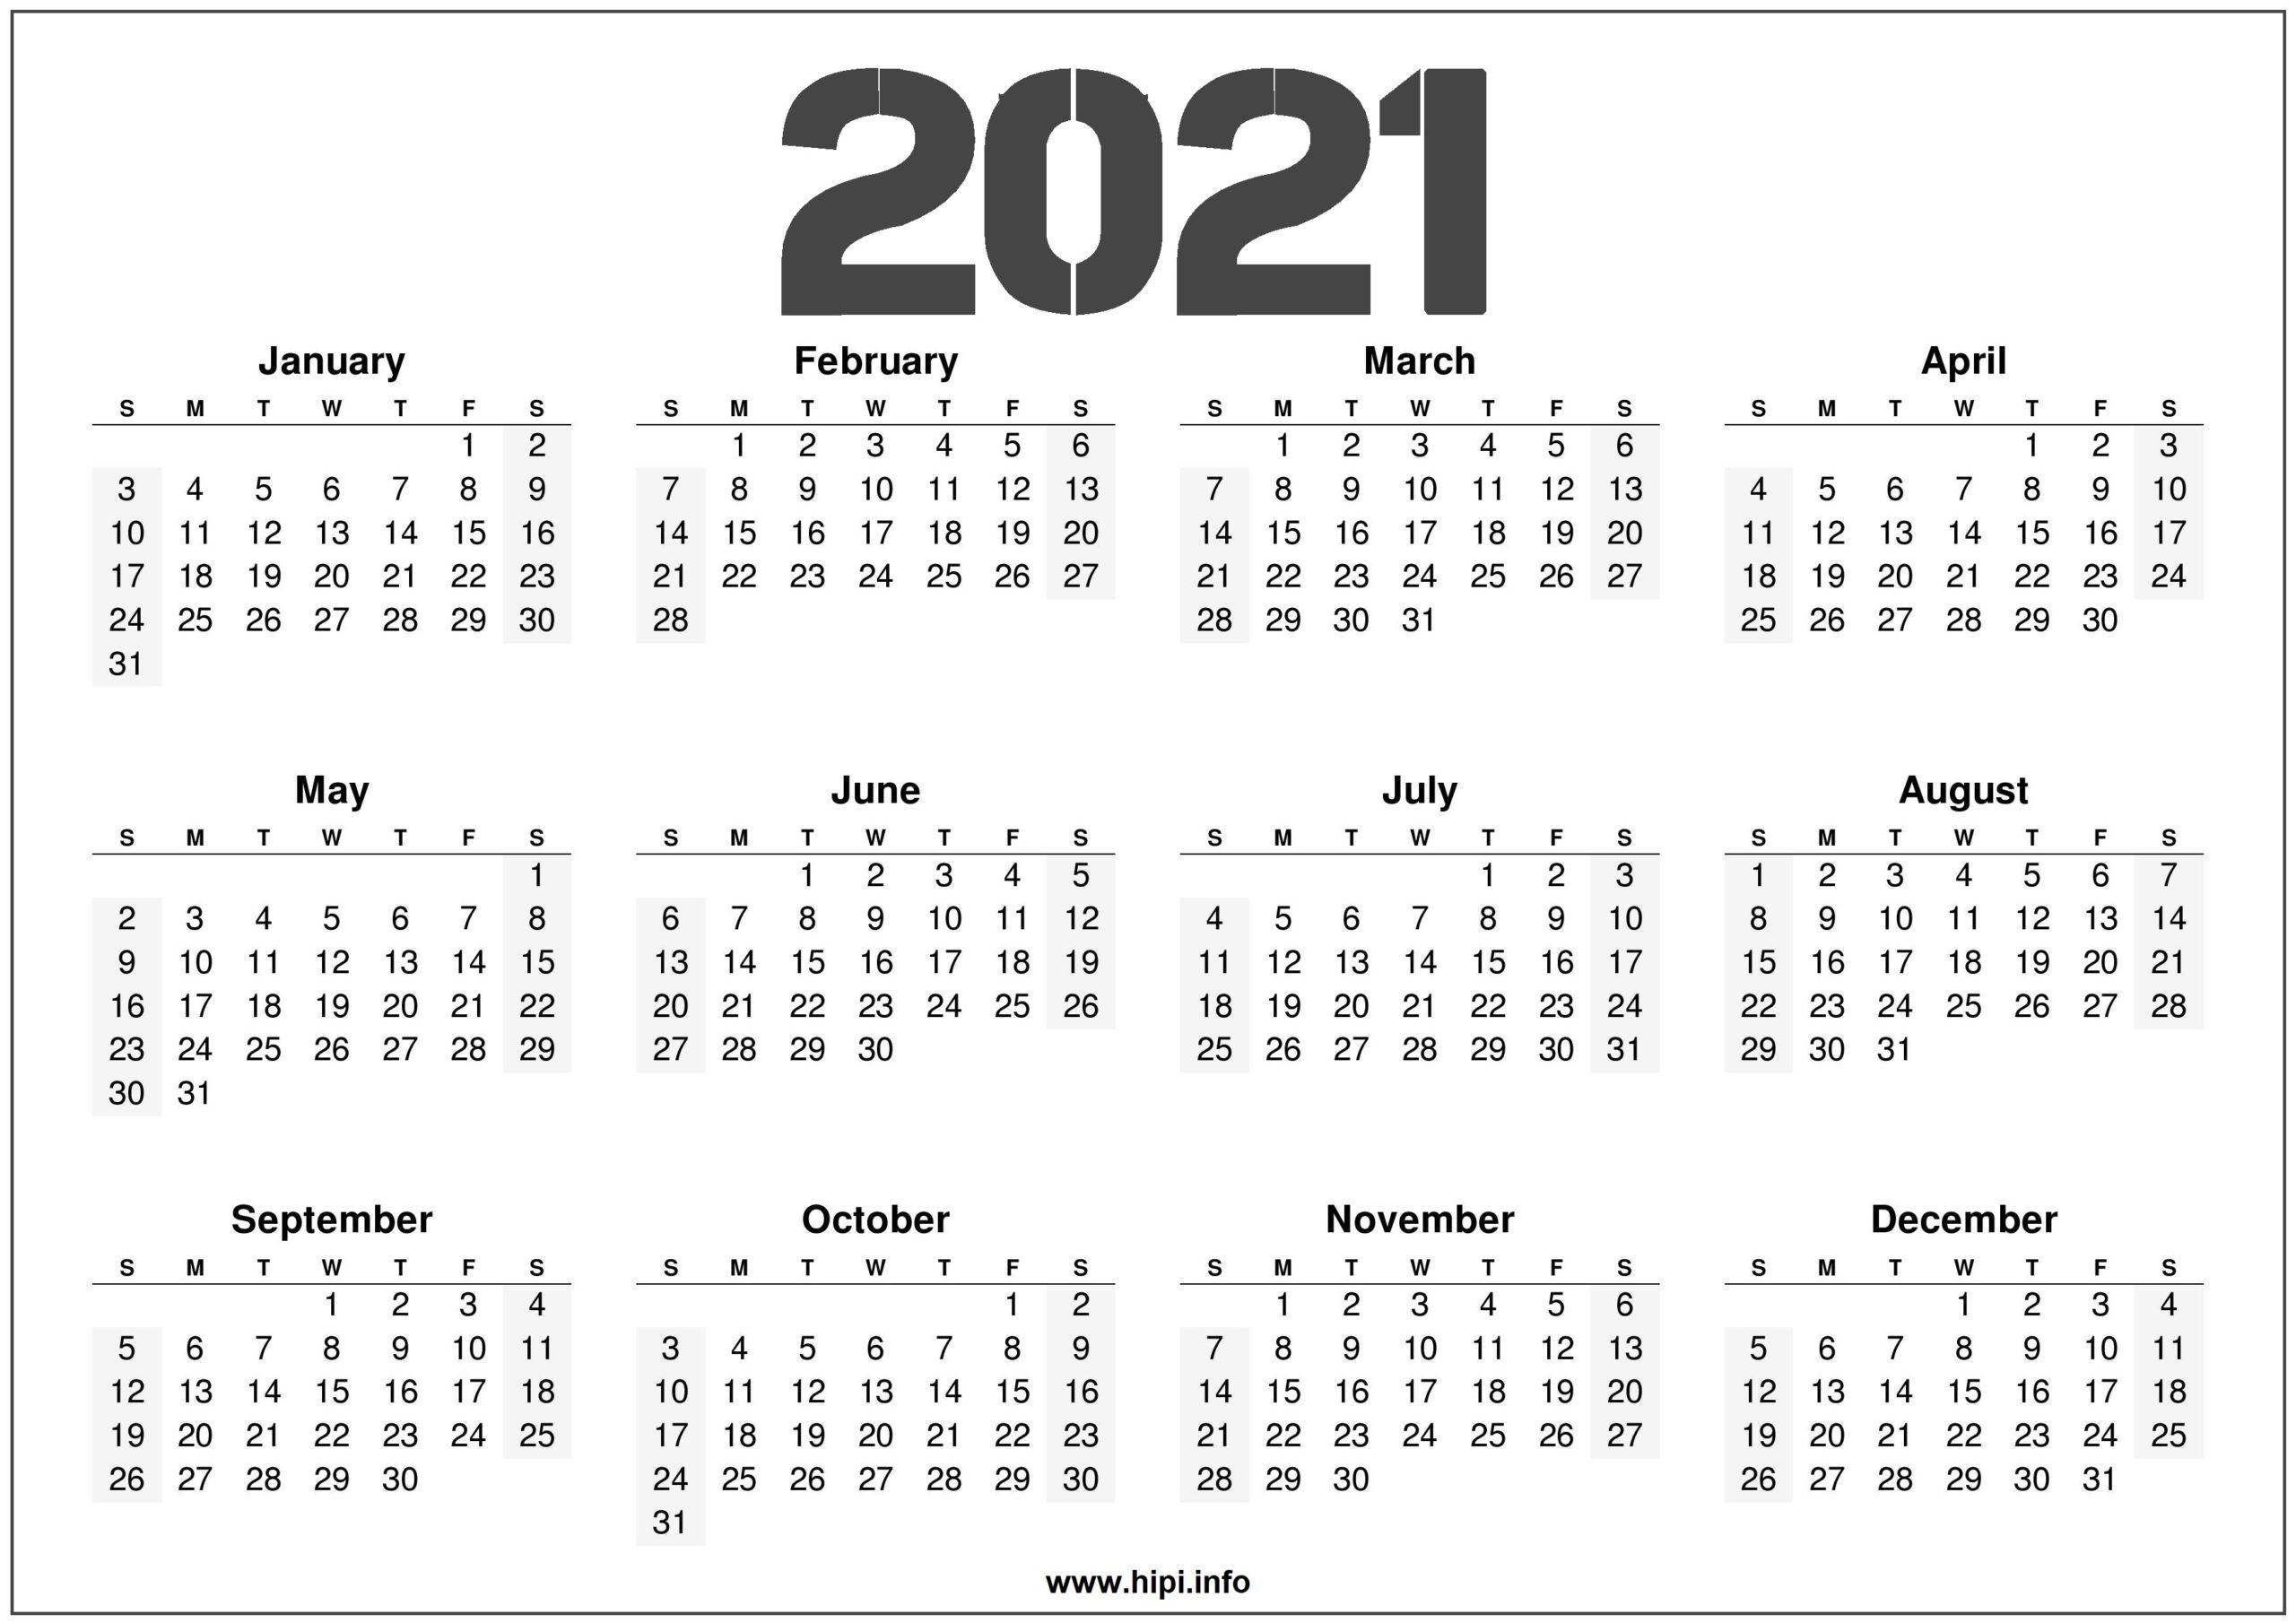 2021 Printable 12 Month Calendar Templates - Hipi